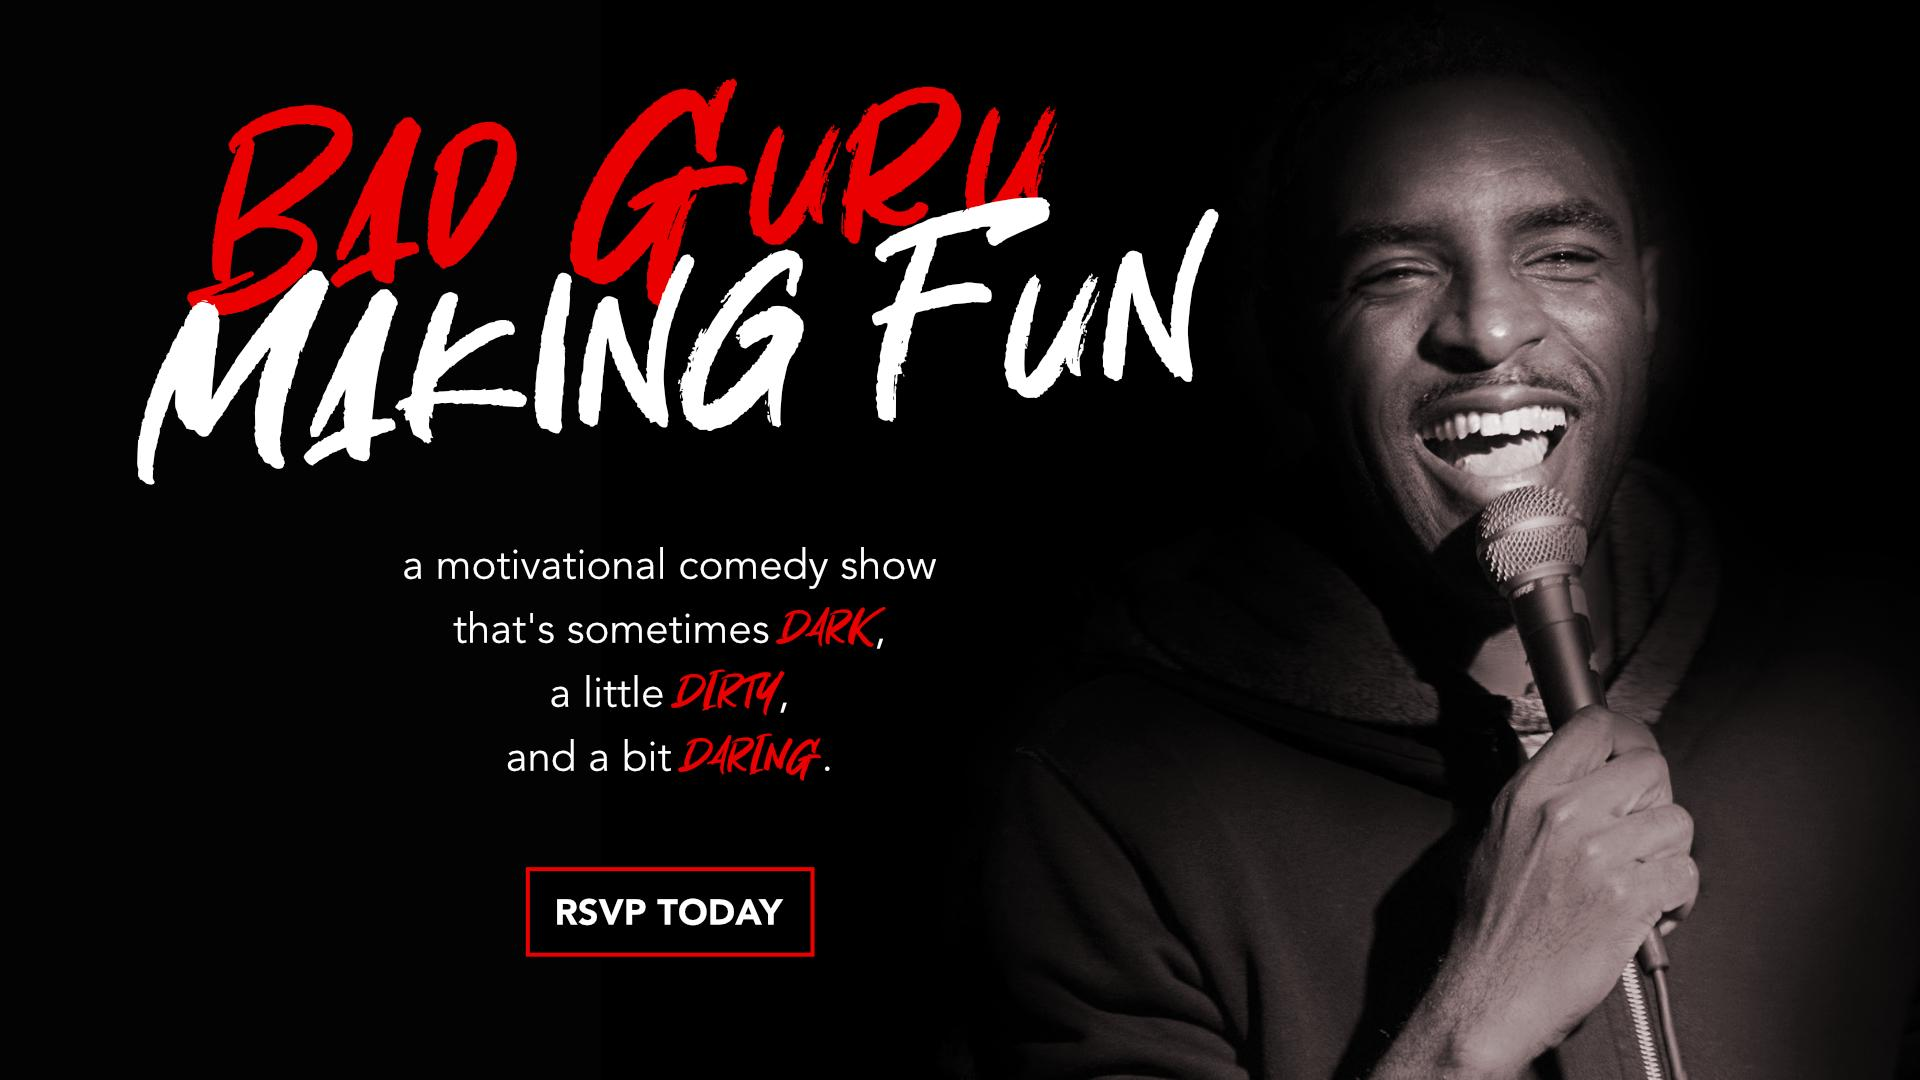 Bad Guru | Making Fun - Motivational Comedy Show - BYOB